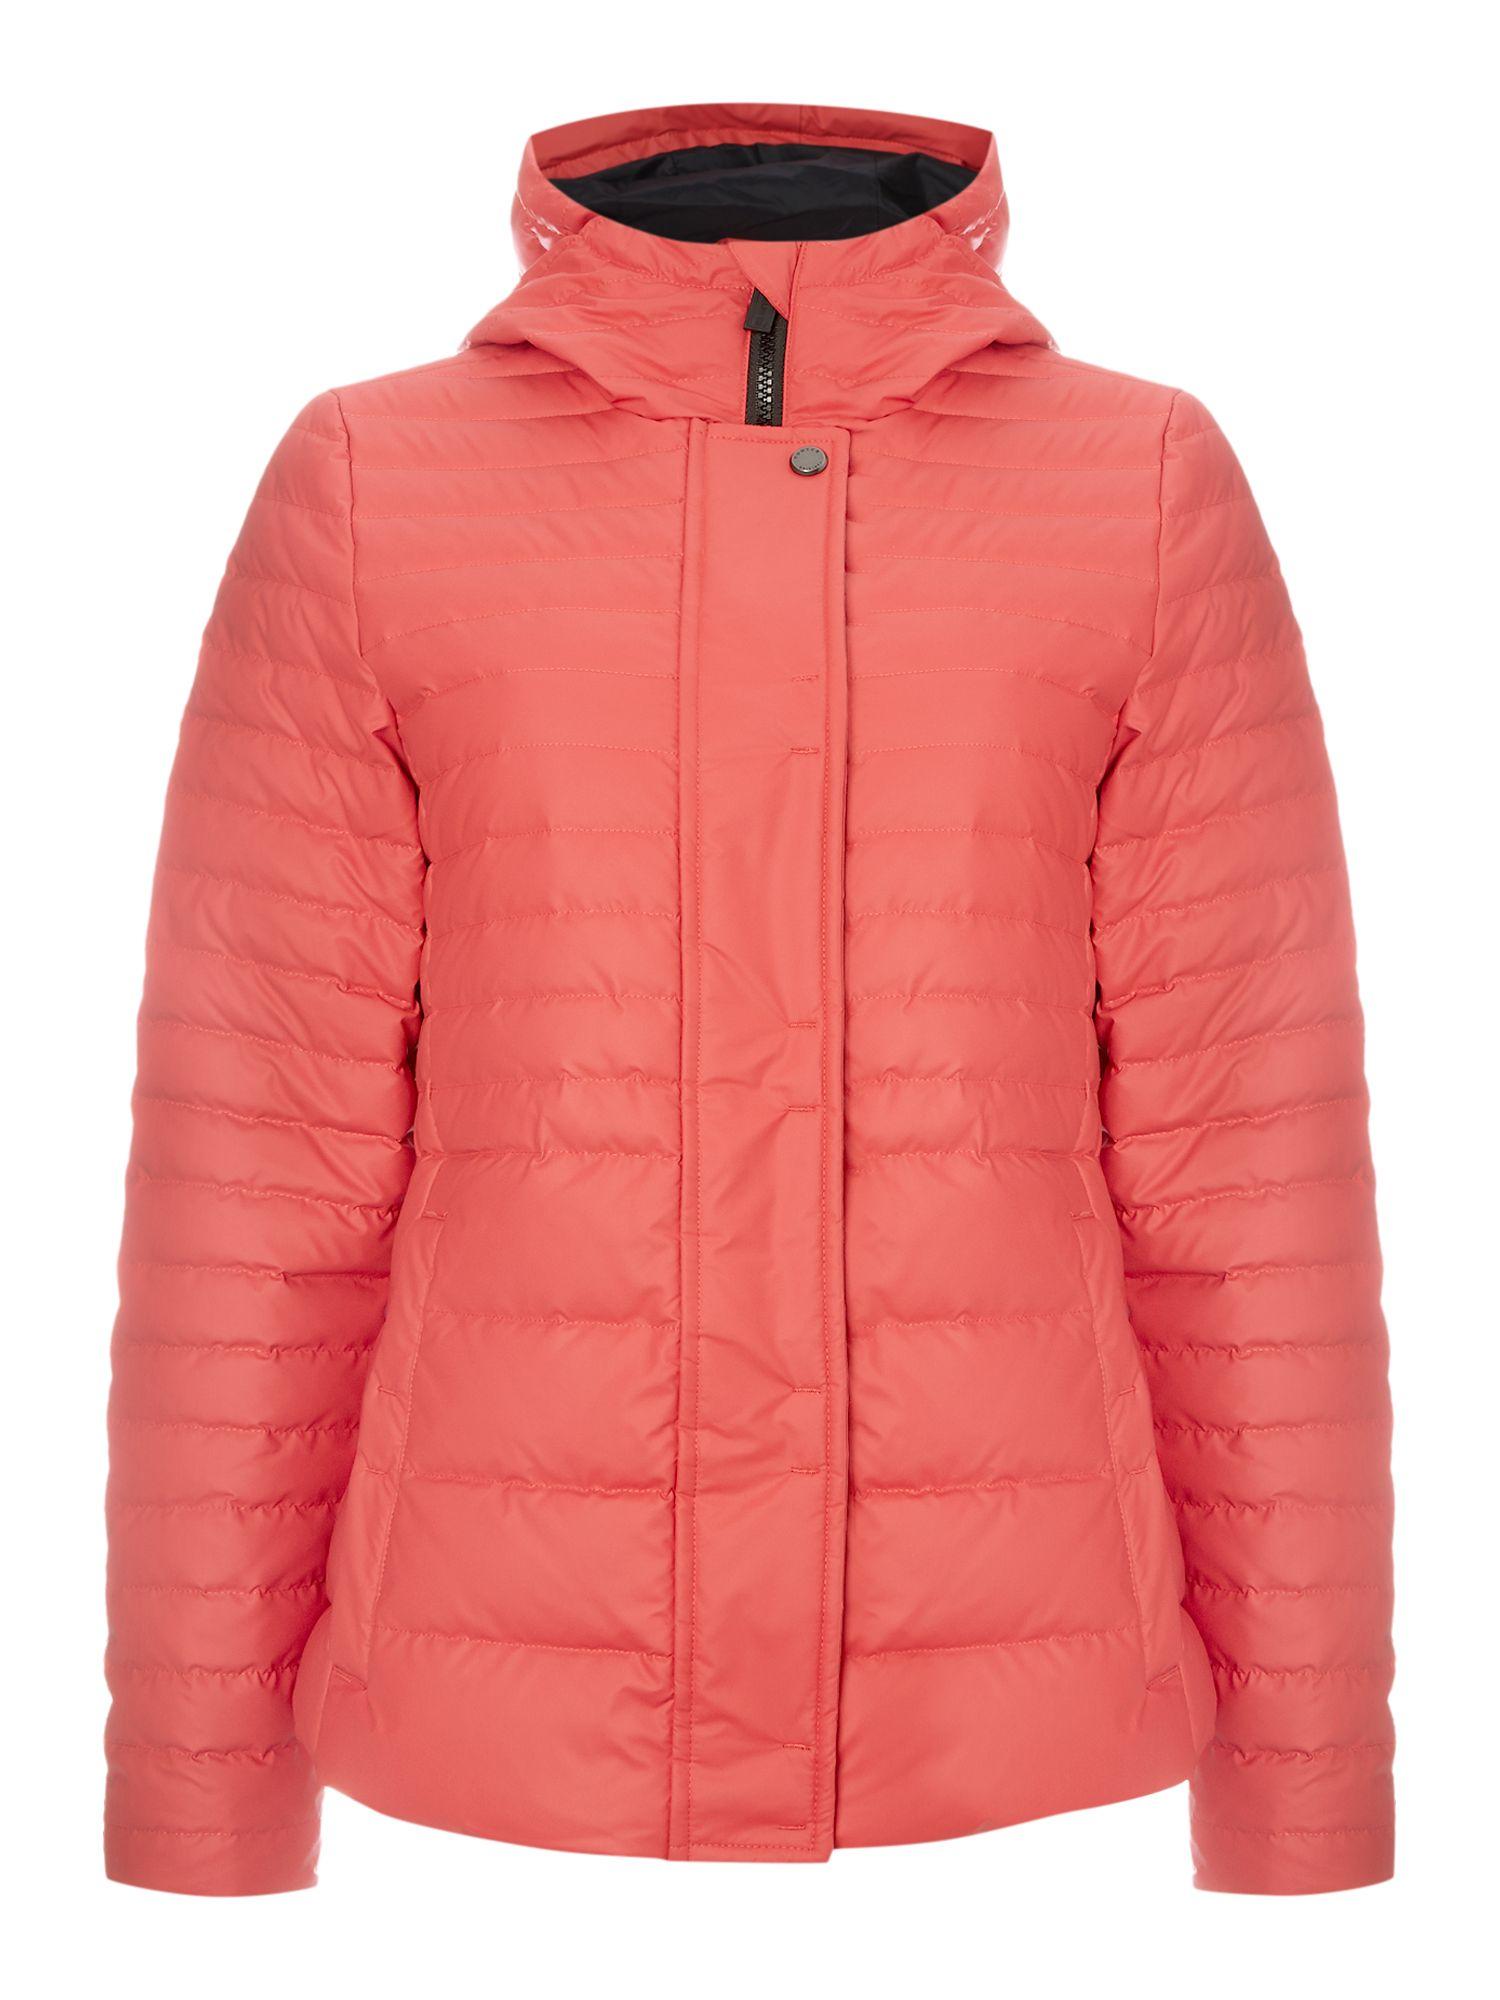 Hunter Original Refined Puffer Jacket in Orange | Lyst